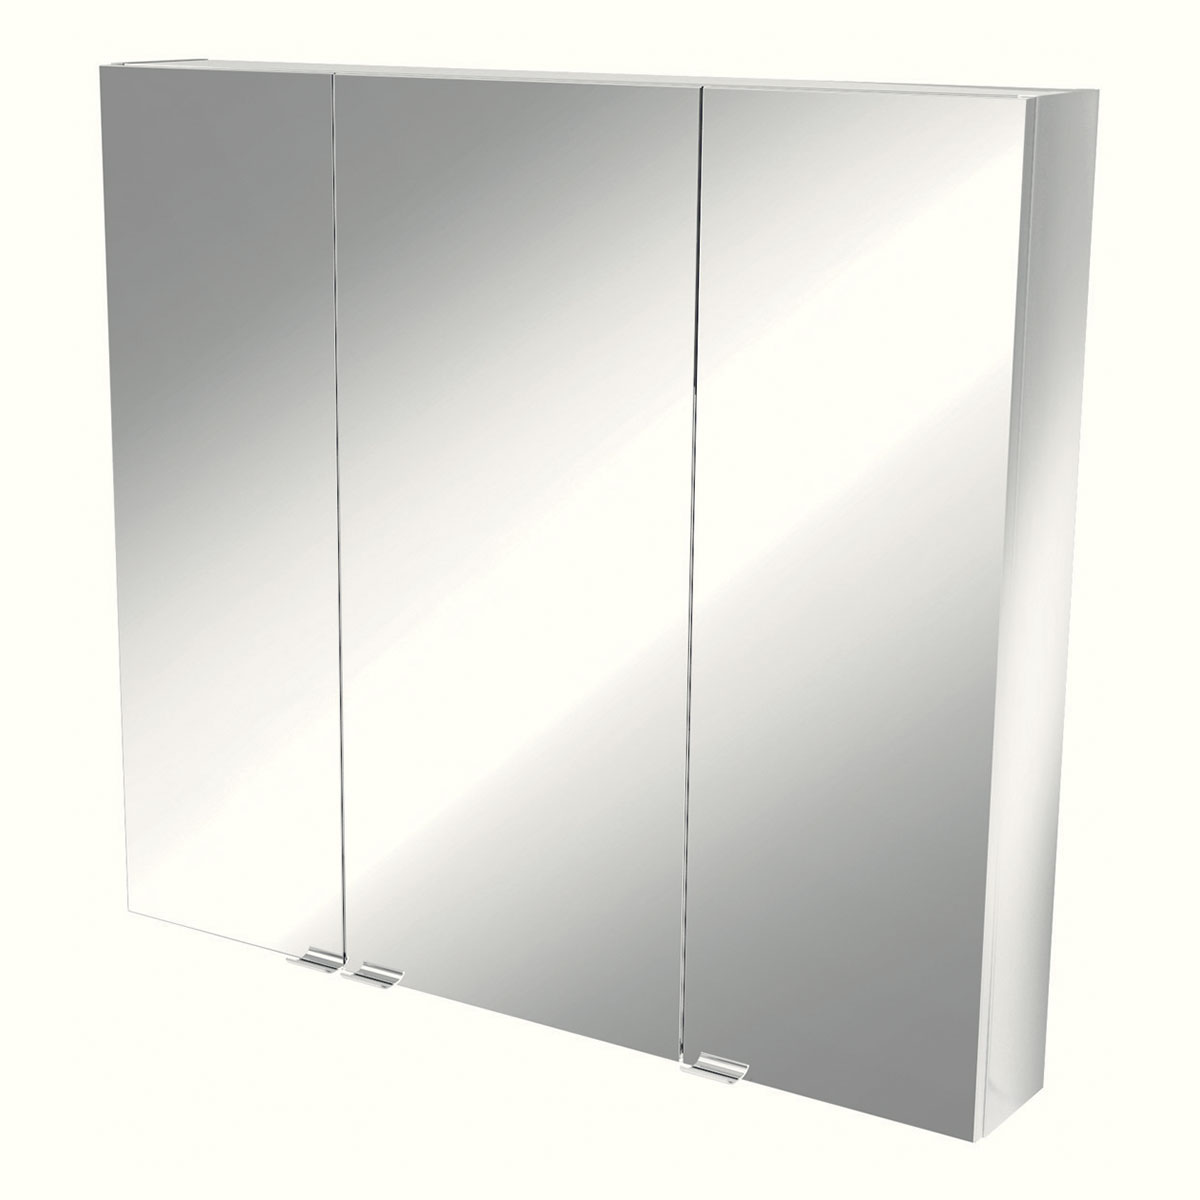 "armoire murale miroir ""imandra"" l. 100 cm"